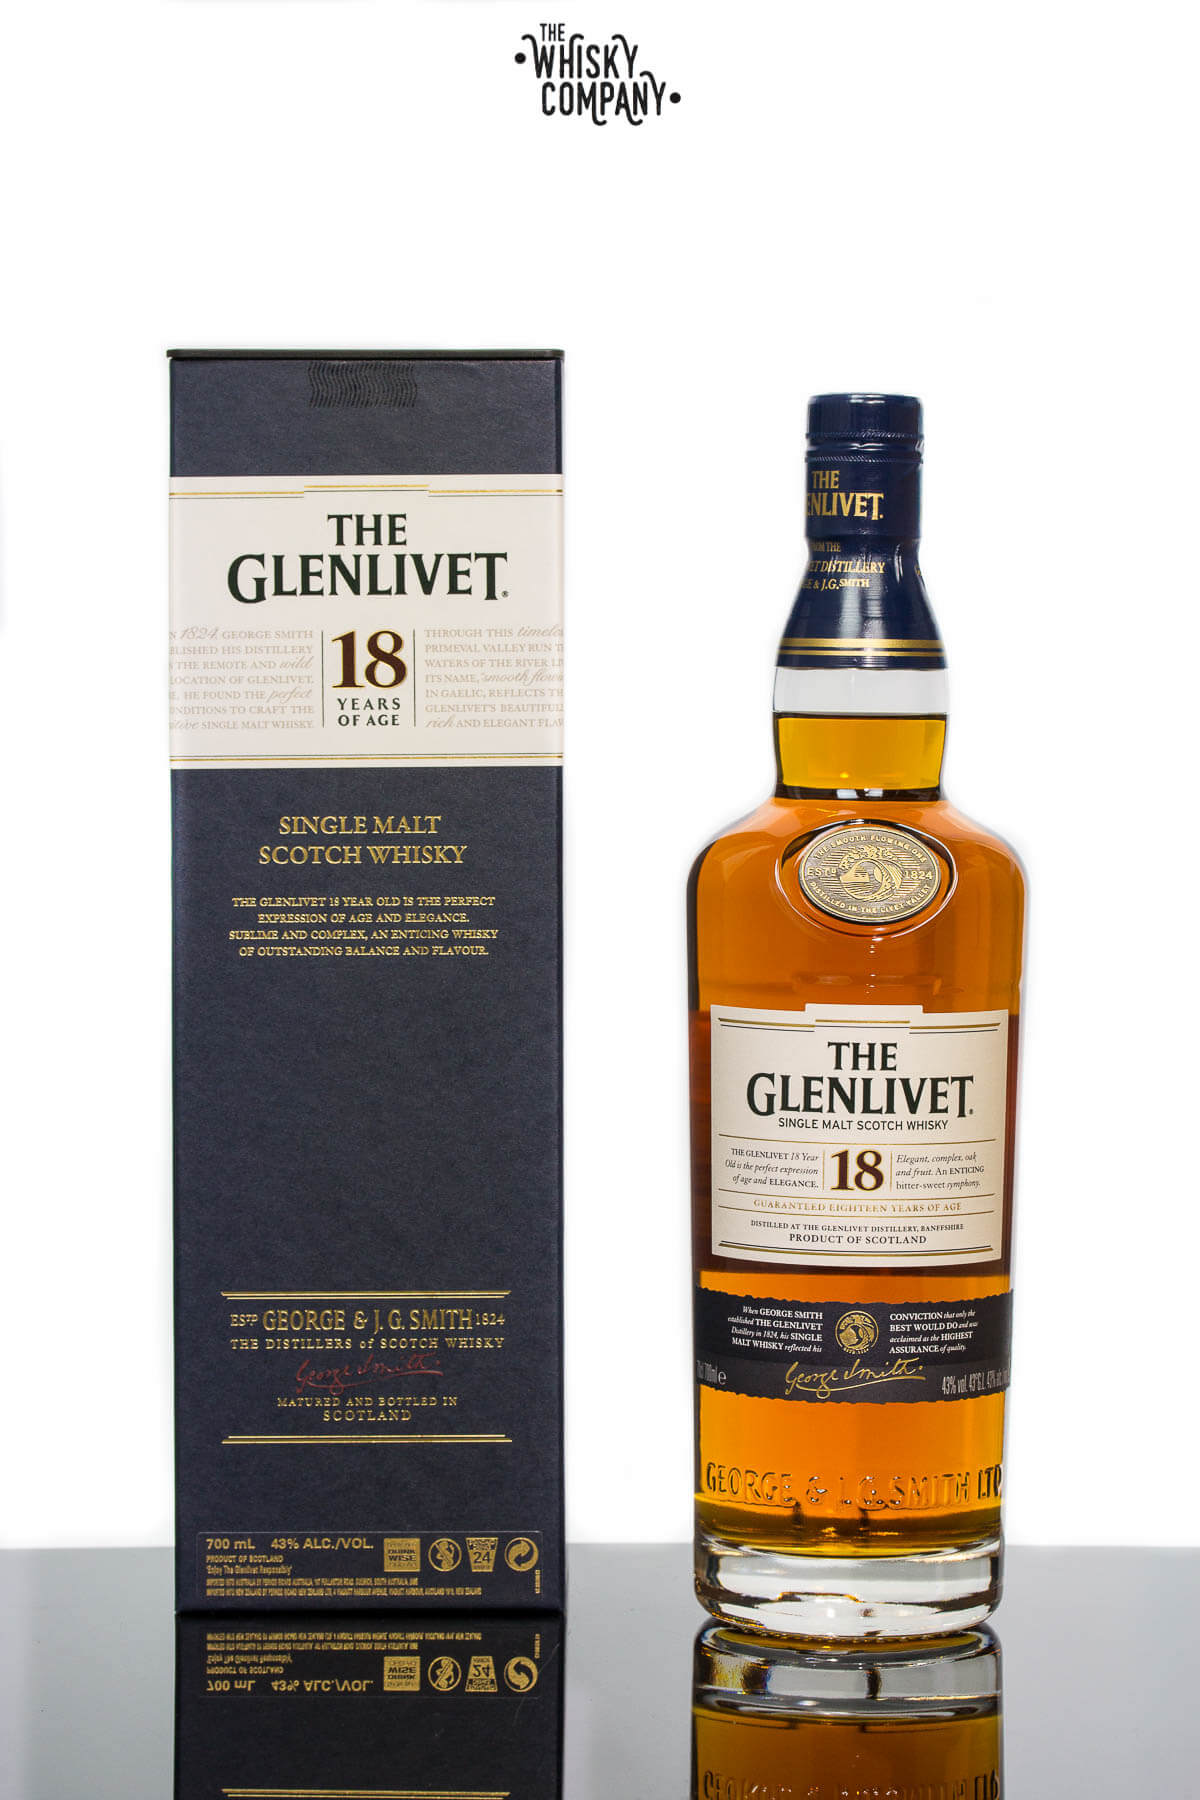 The Glenlivet 18 Year Old Speyside Single Malt Scotch Whisky